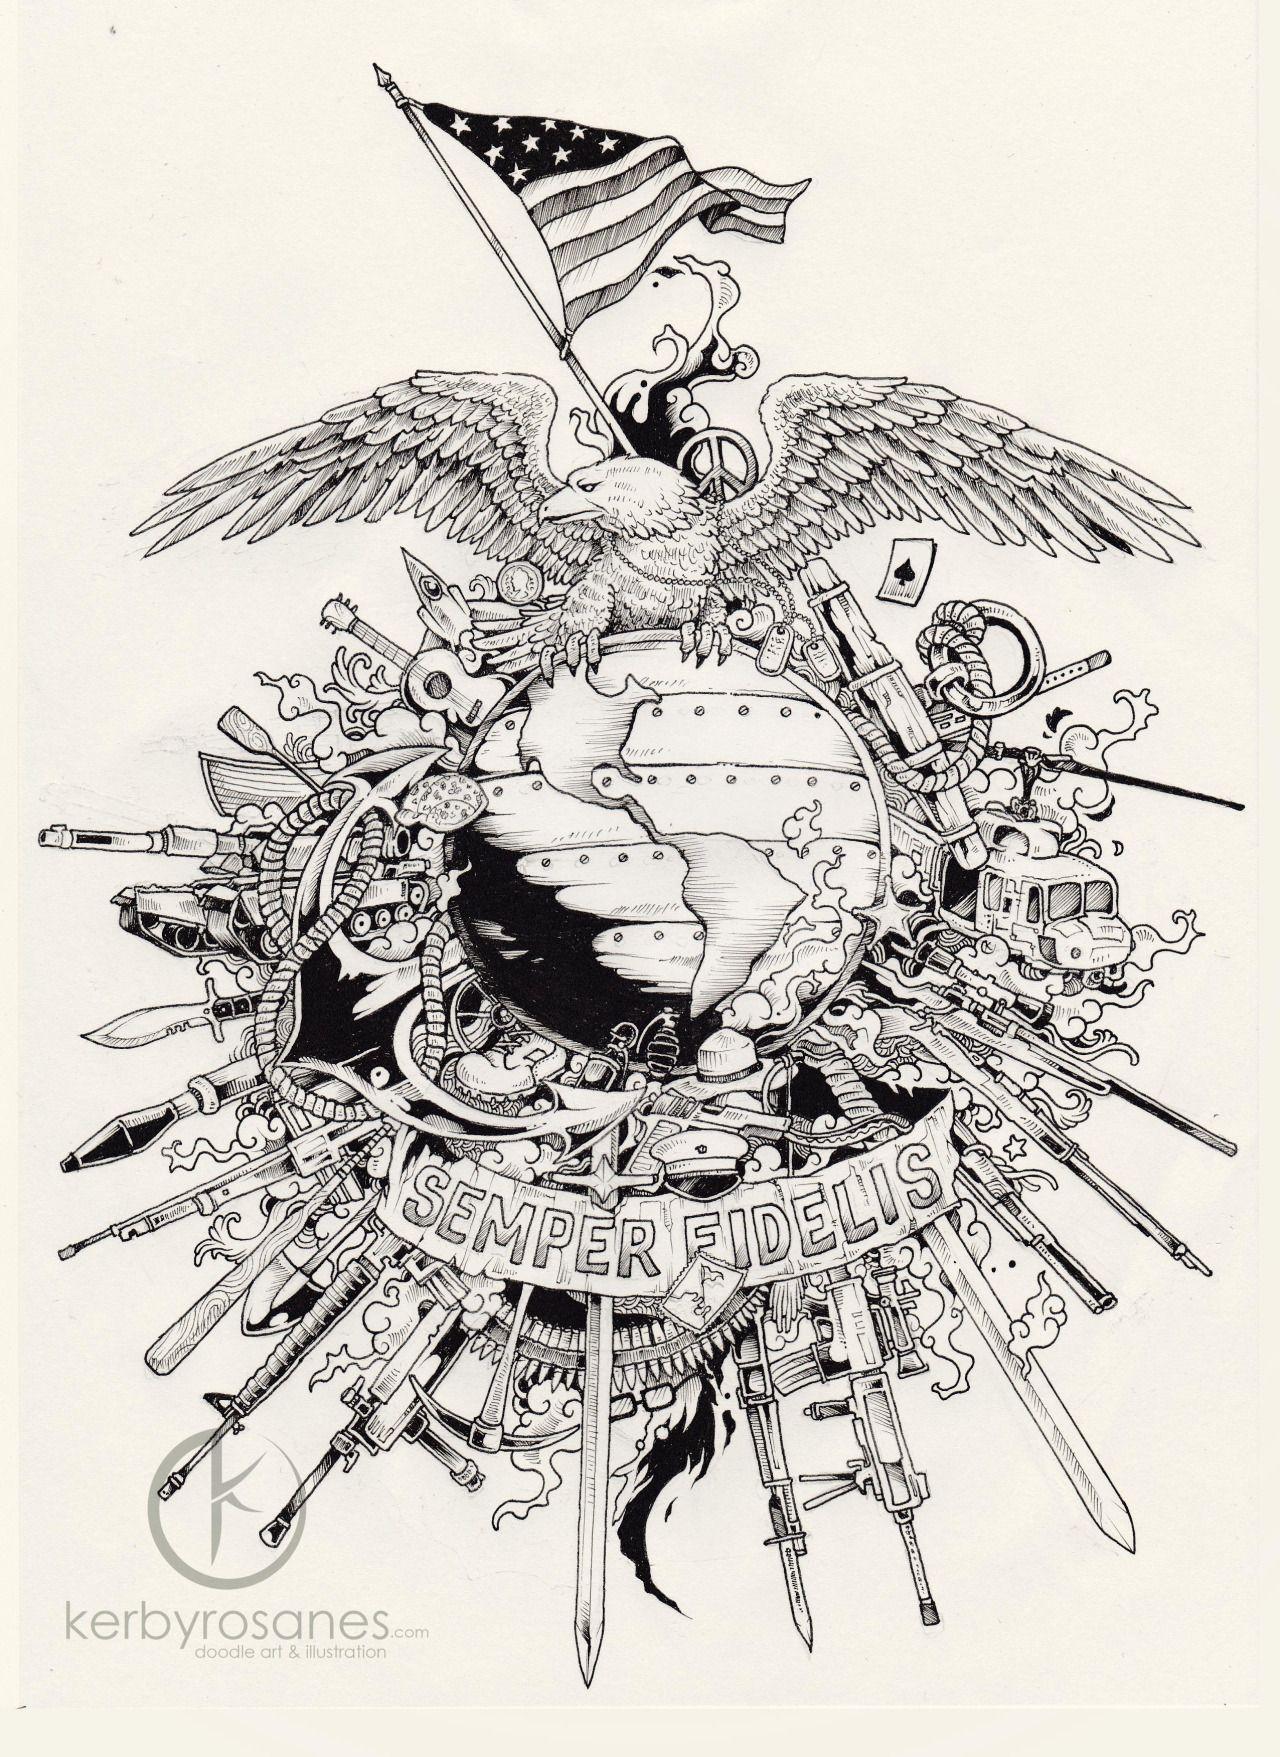 Semper Fidelis Sketchy Stories by Kerby Rosanes | Artist Kerby ...